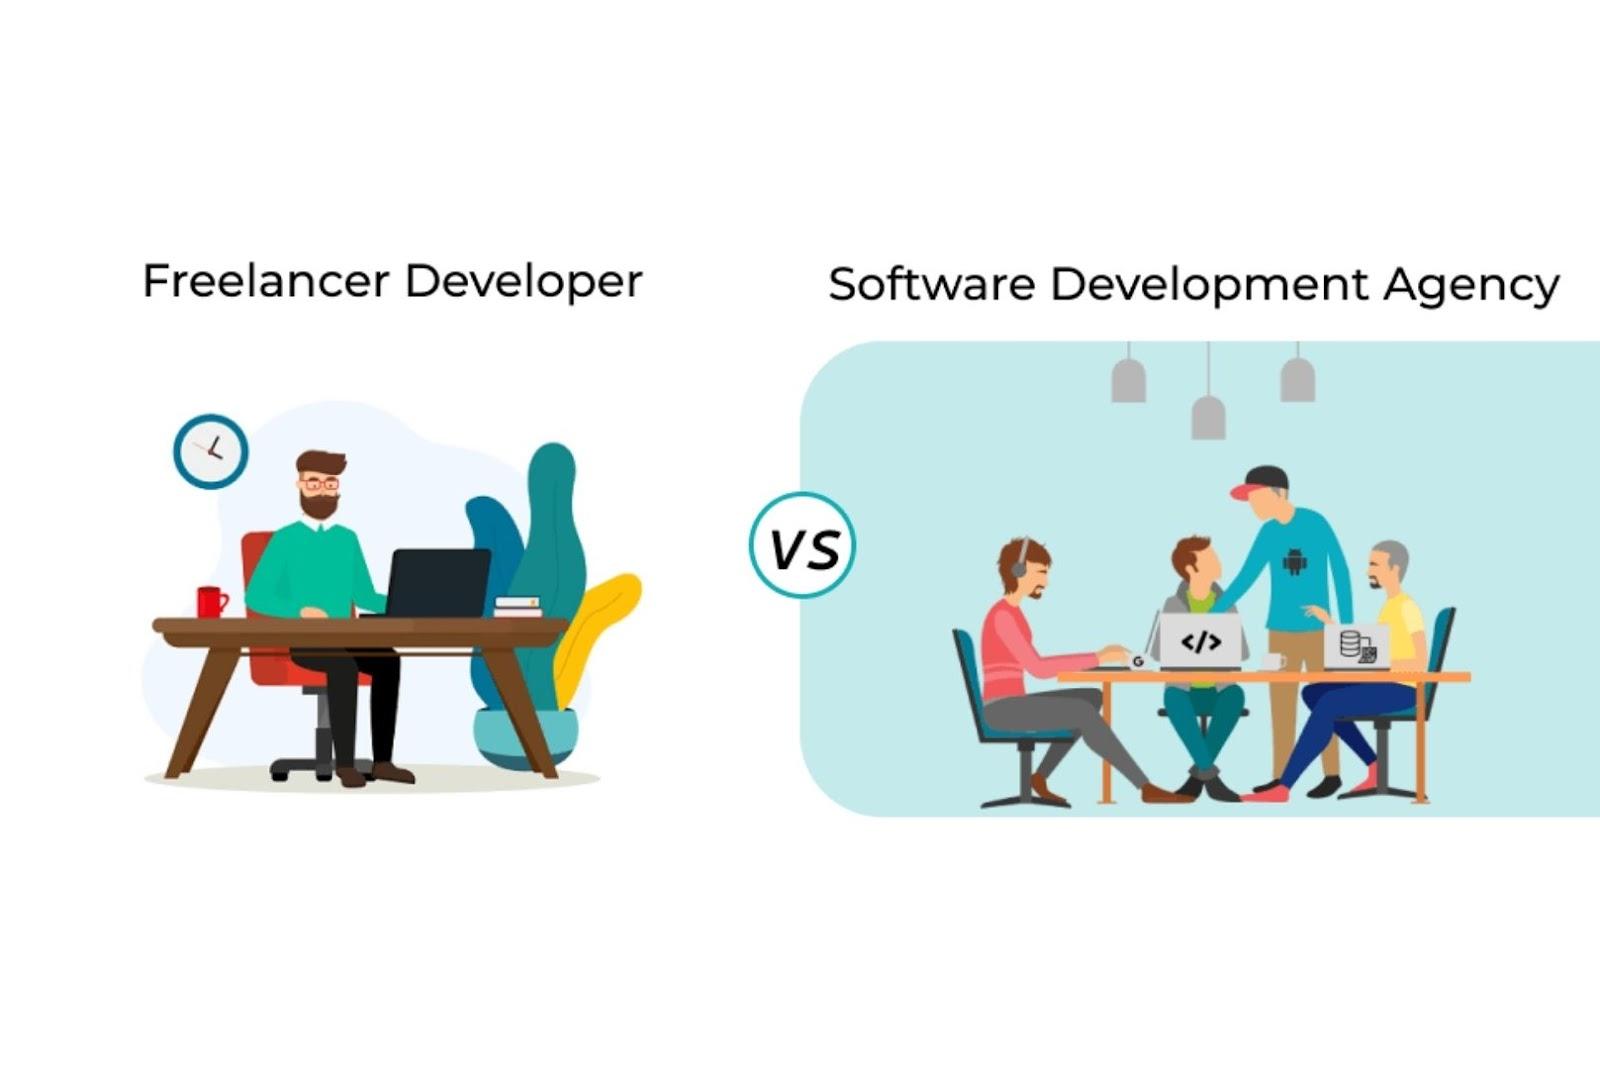 costs of hiring a freelance developer vs hiring a software development agency